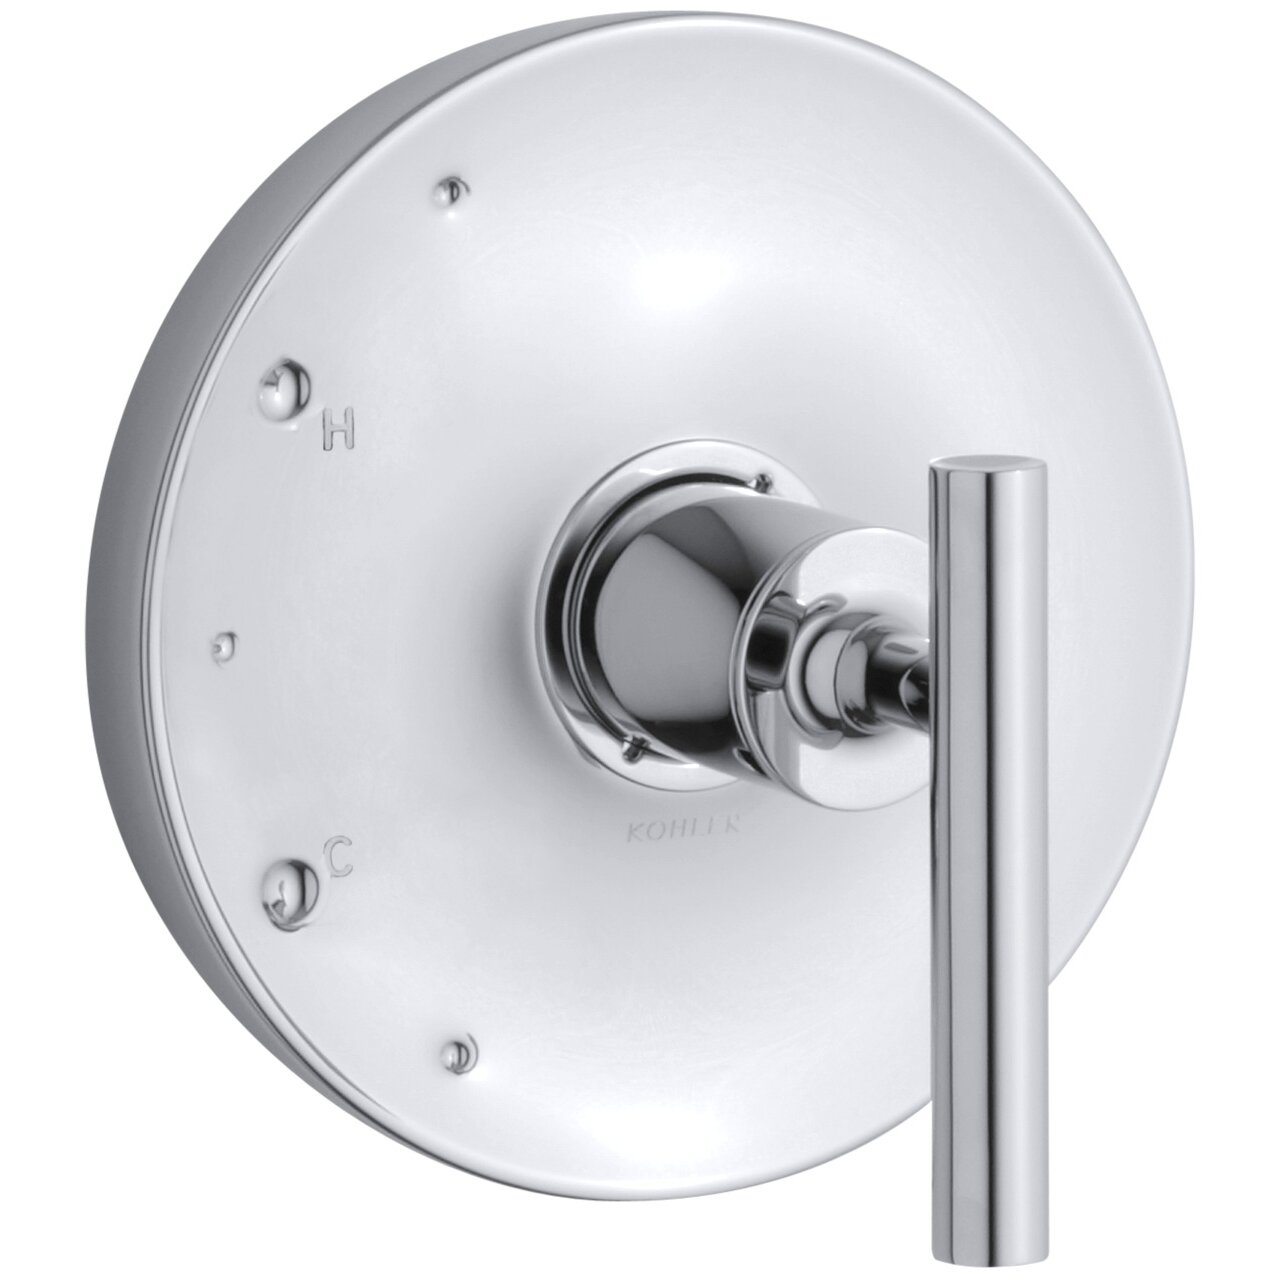 kohler purist valve trim lever handle for rite temp pressure kohler purist valve trim lever handle for rite temp pressure balancing valve